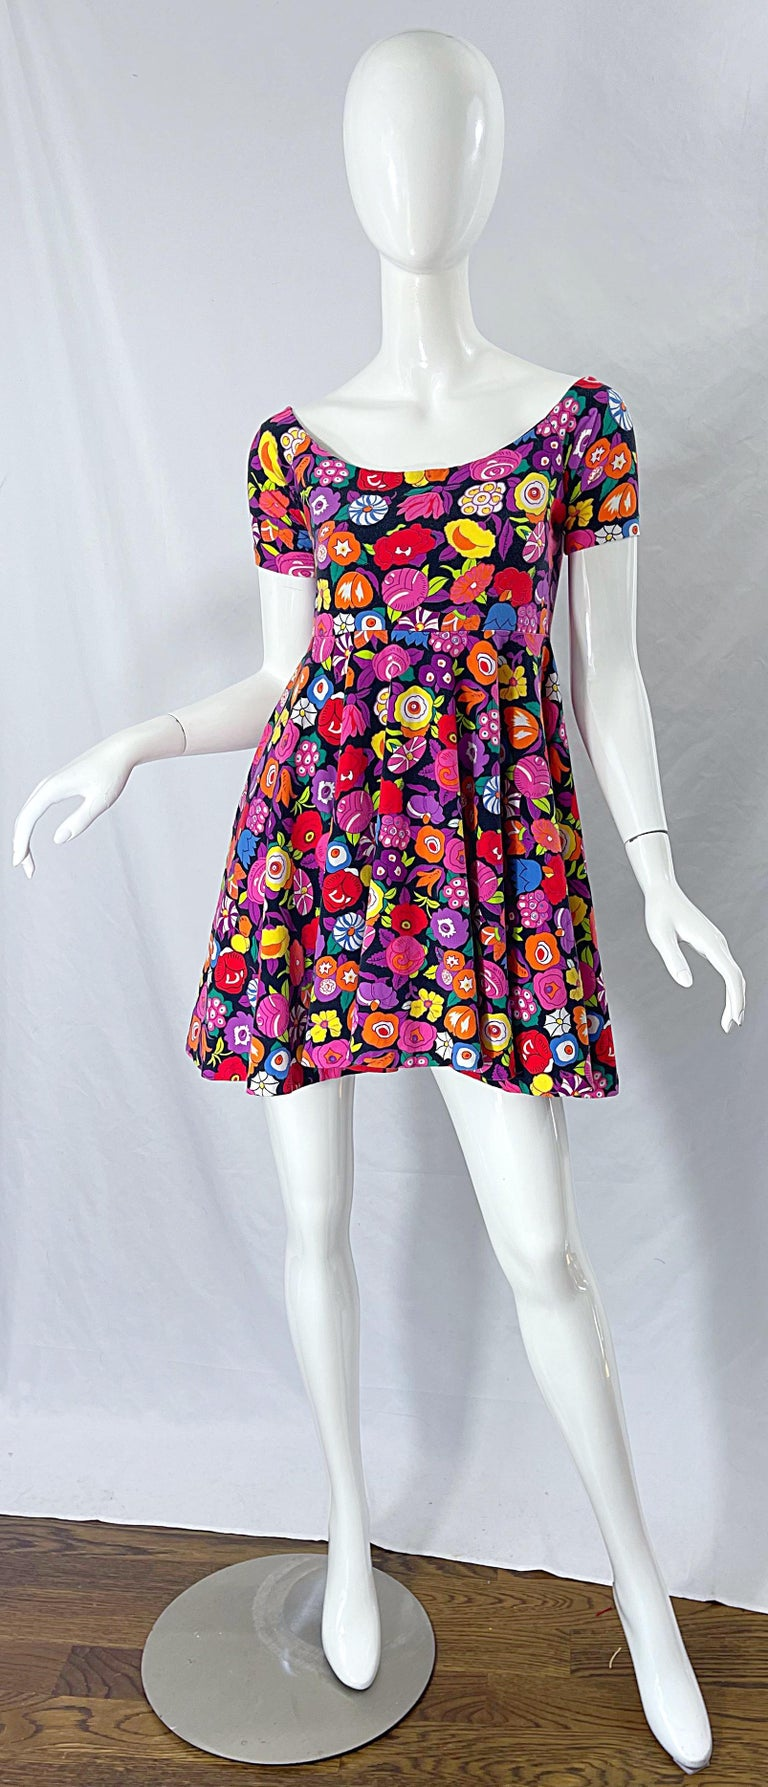 Women's 1980s Betsey Johnson Punk Label Off Shoulder Bright Flower 80s Mini Dress For Sale